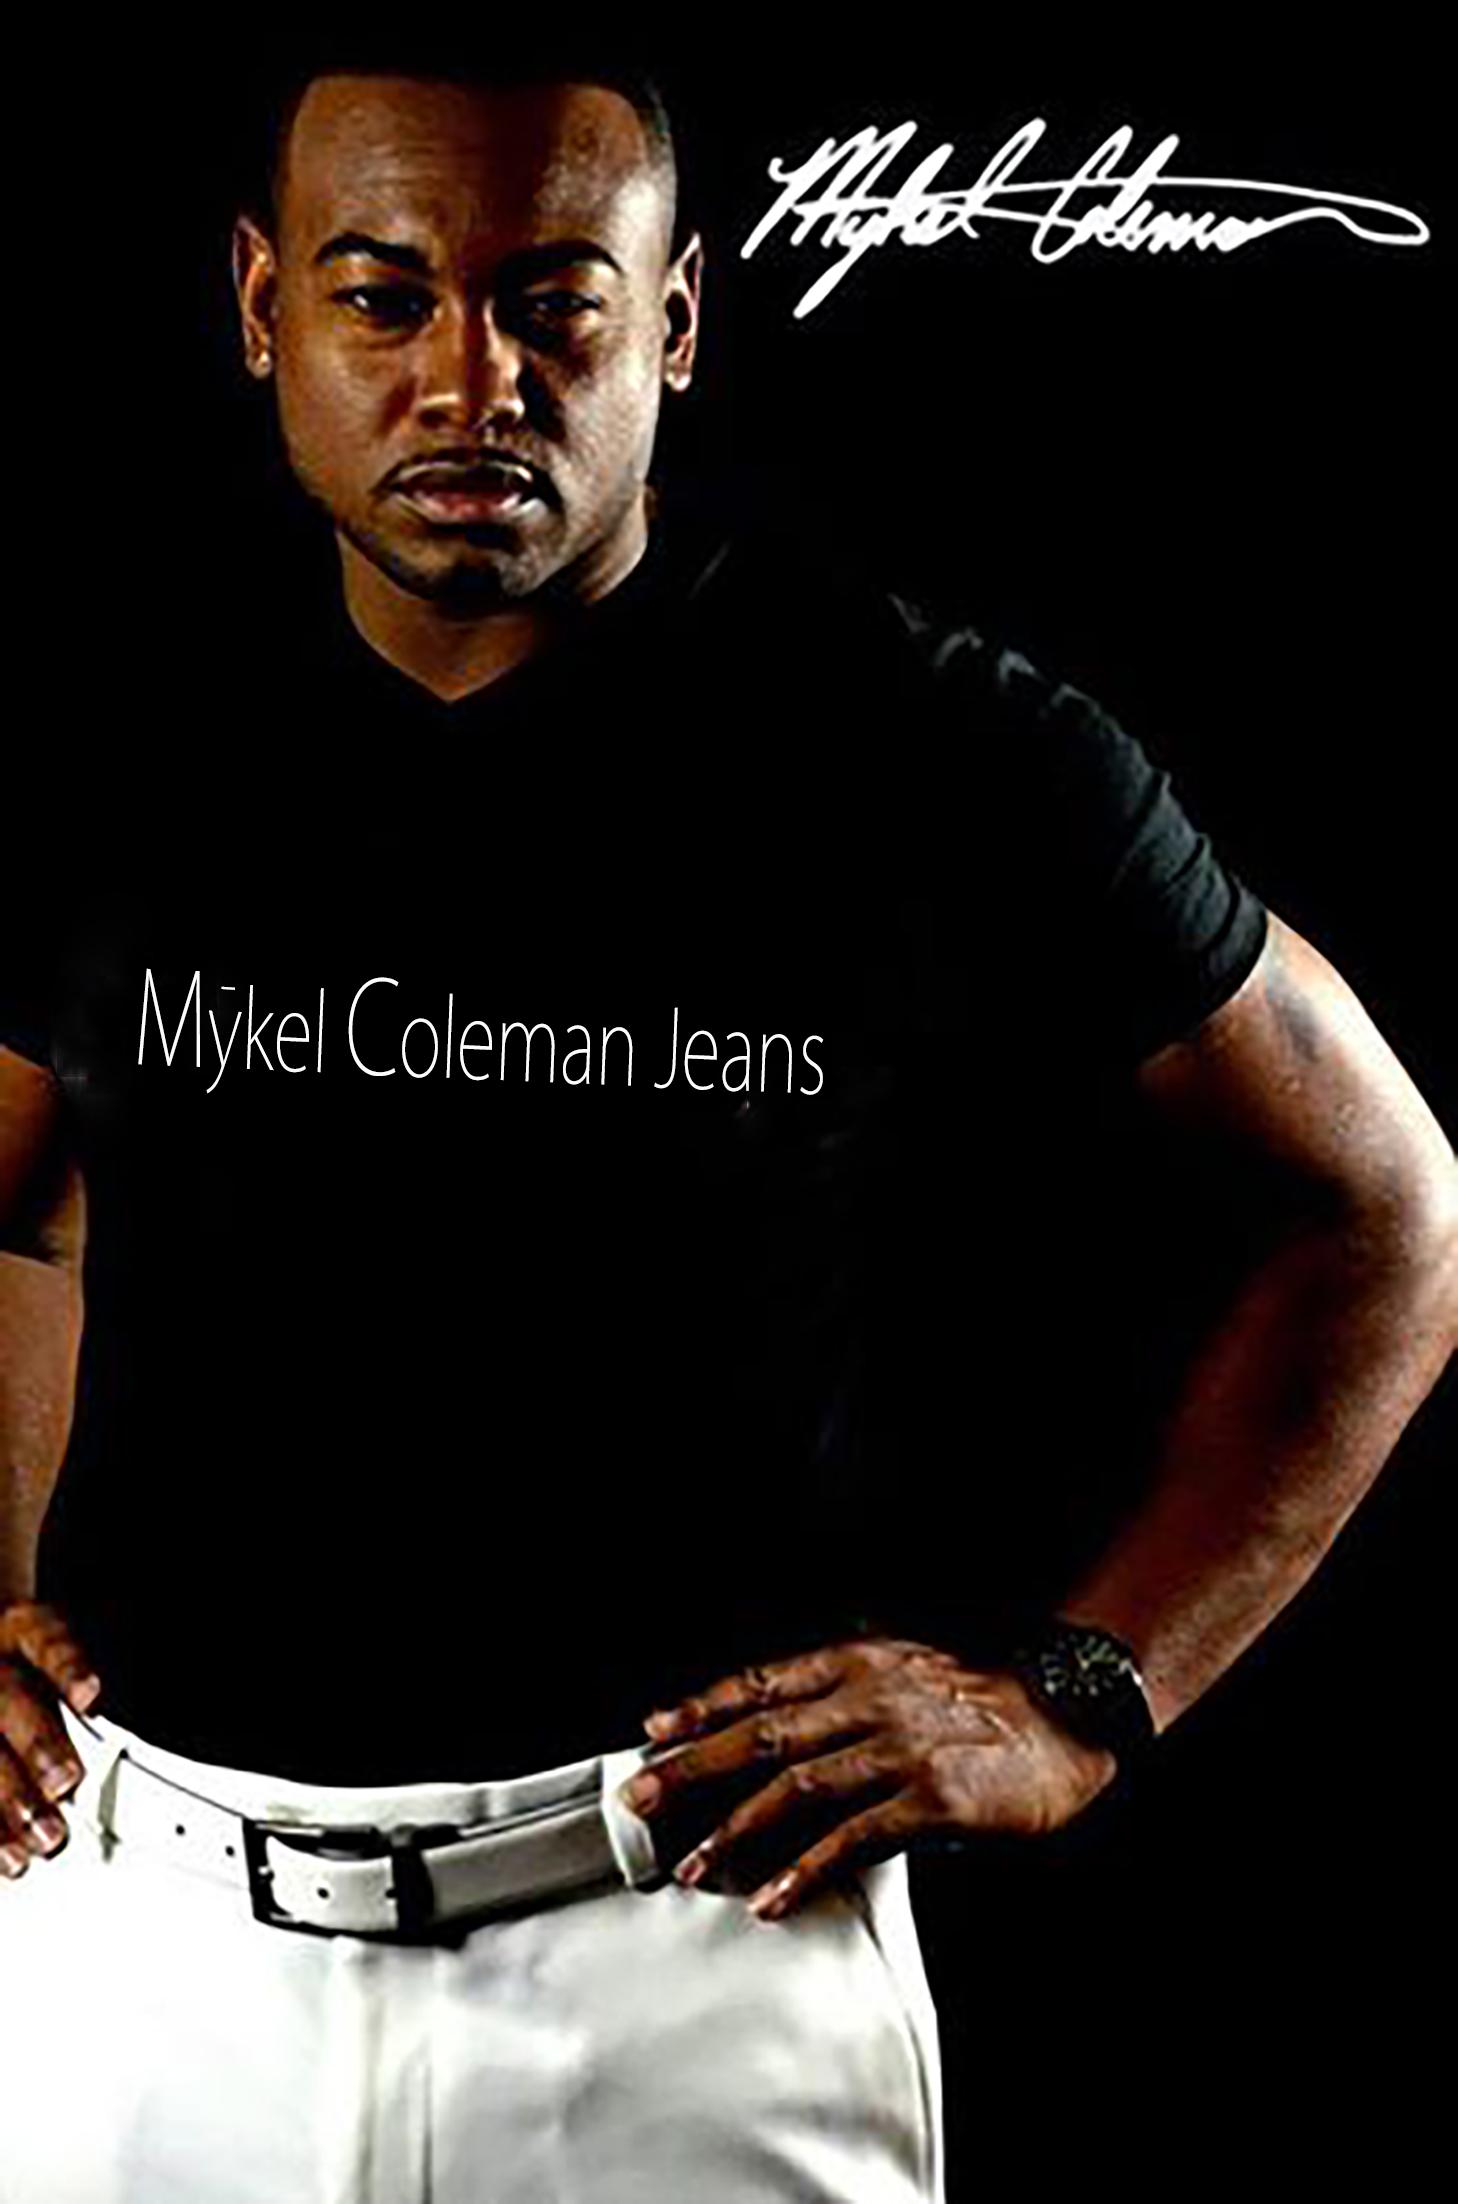 Mykel Coleman Jeans Shirt